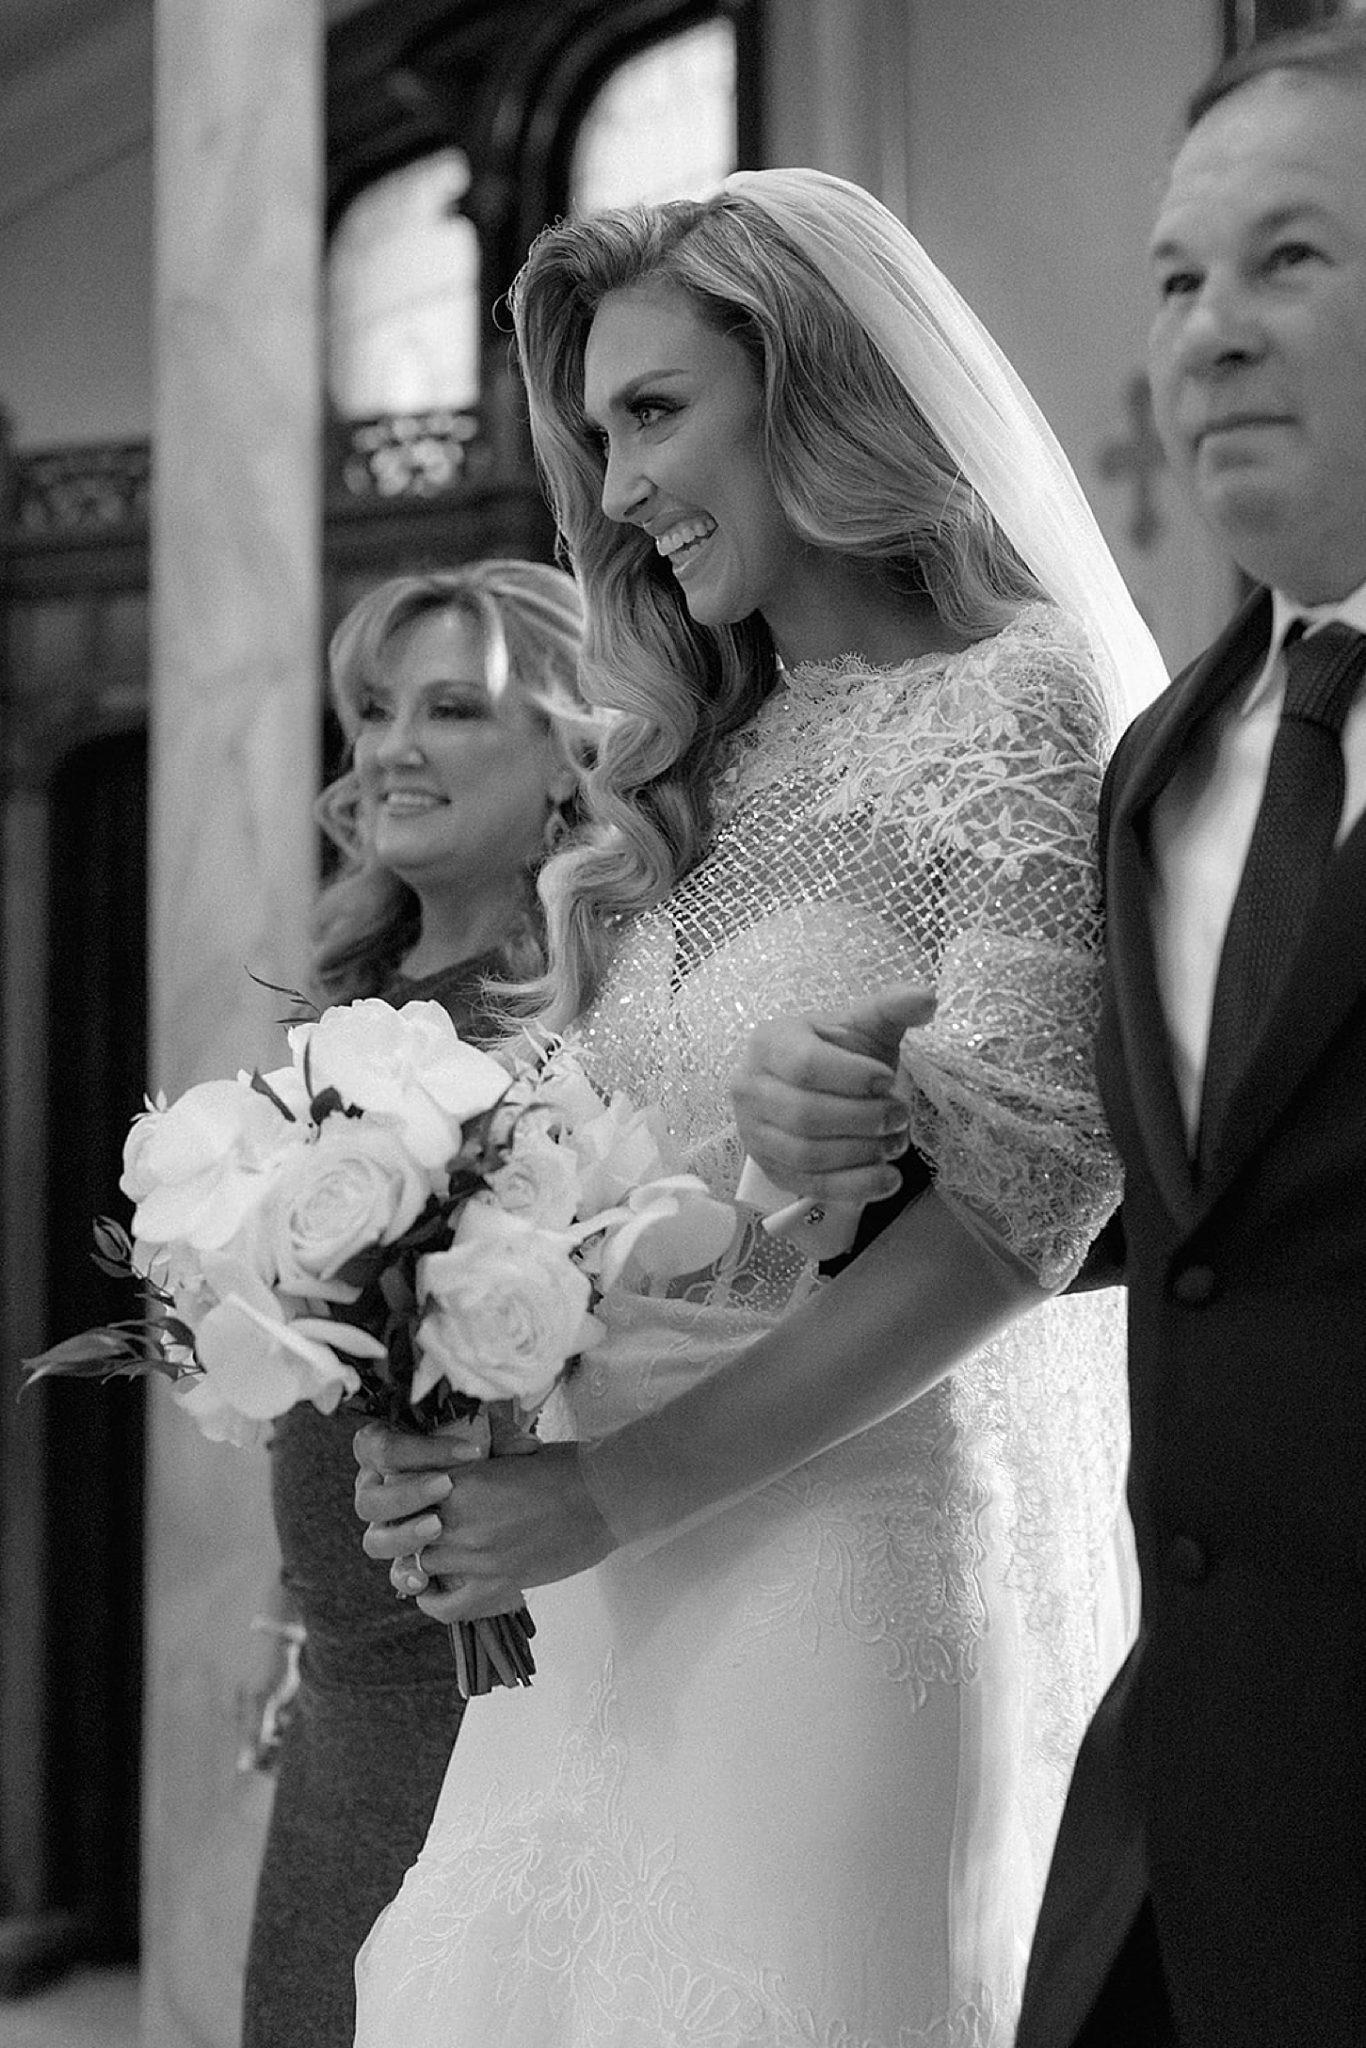 Atlantic City Wedding Photography Studio by Magdalena Studios Lexy Cha 0019 scaled